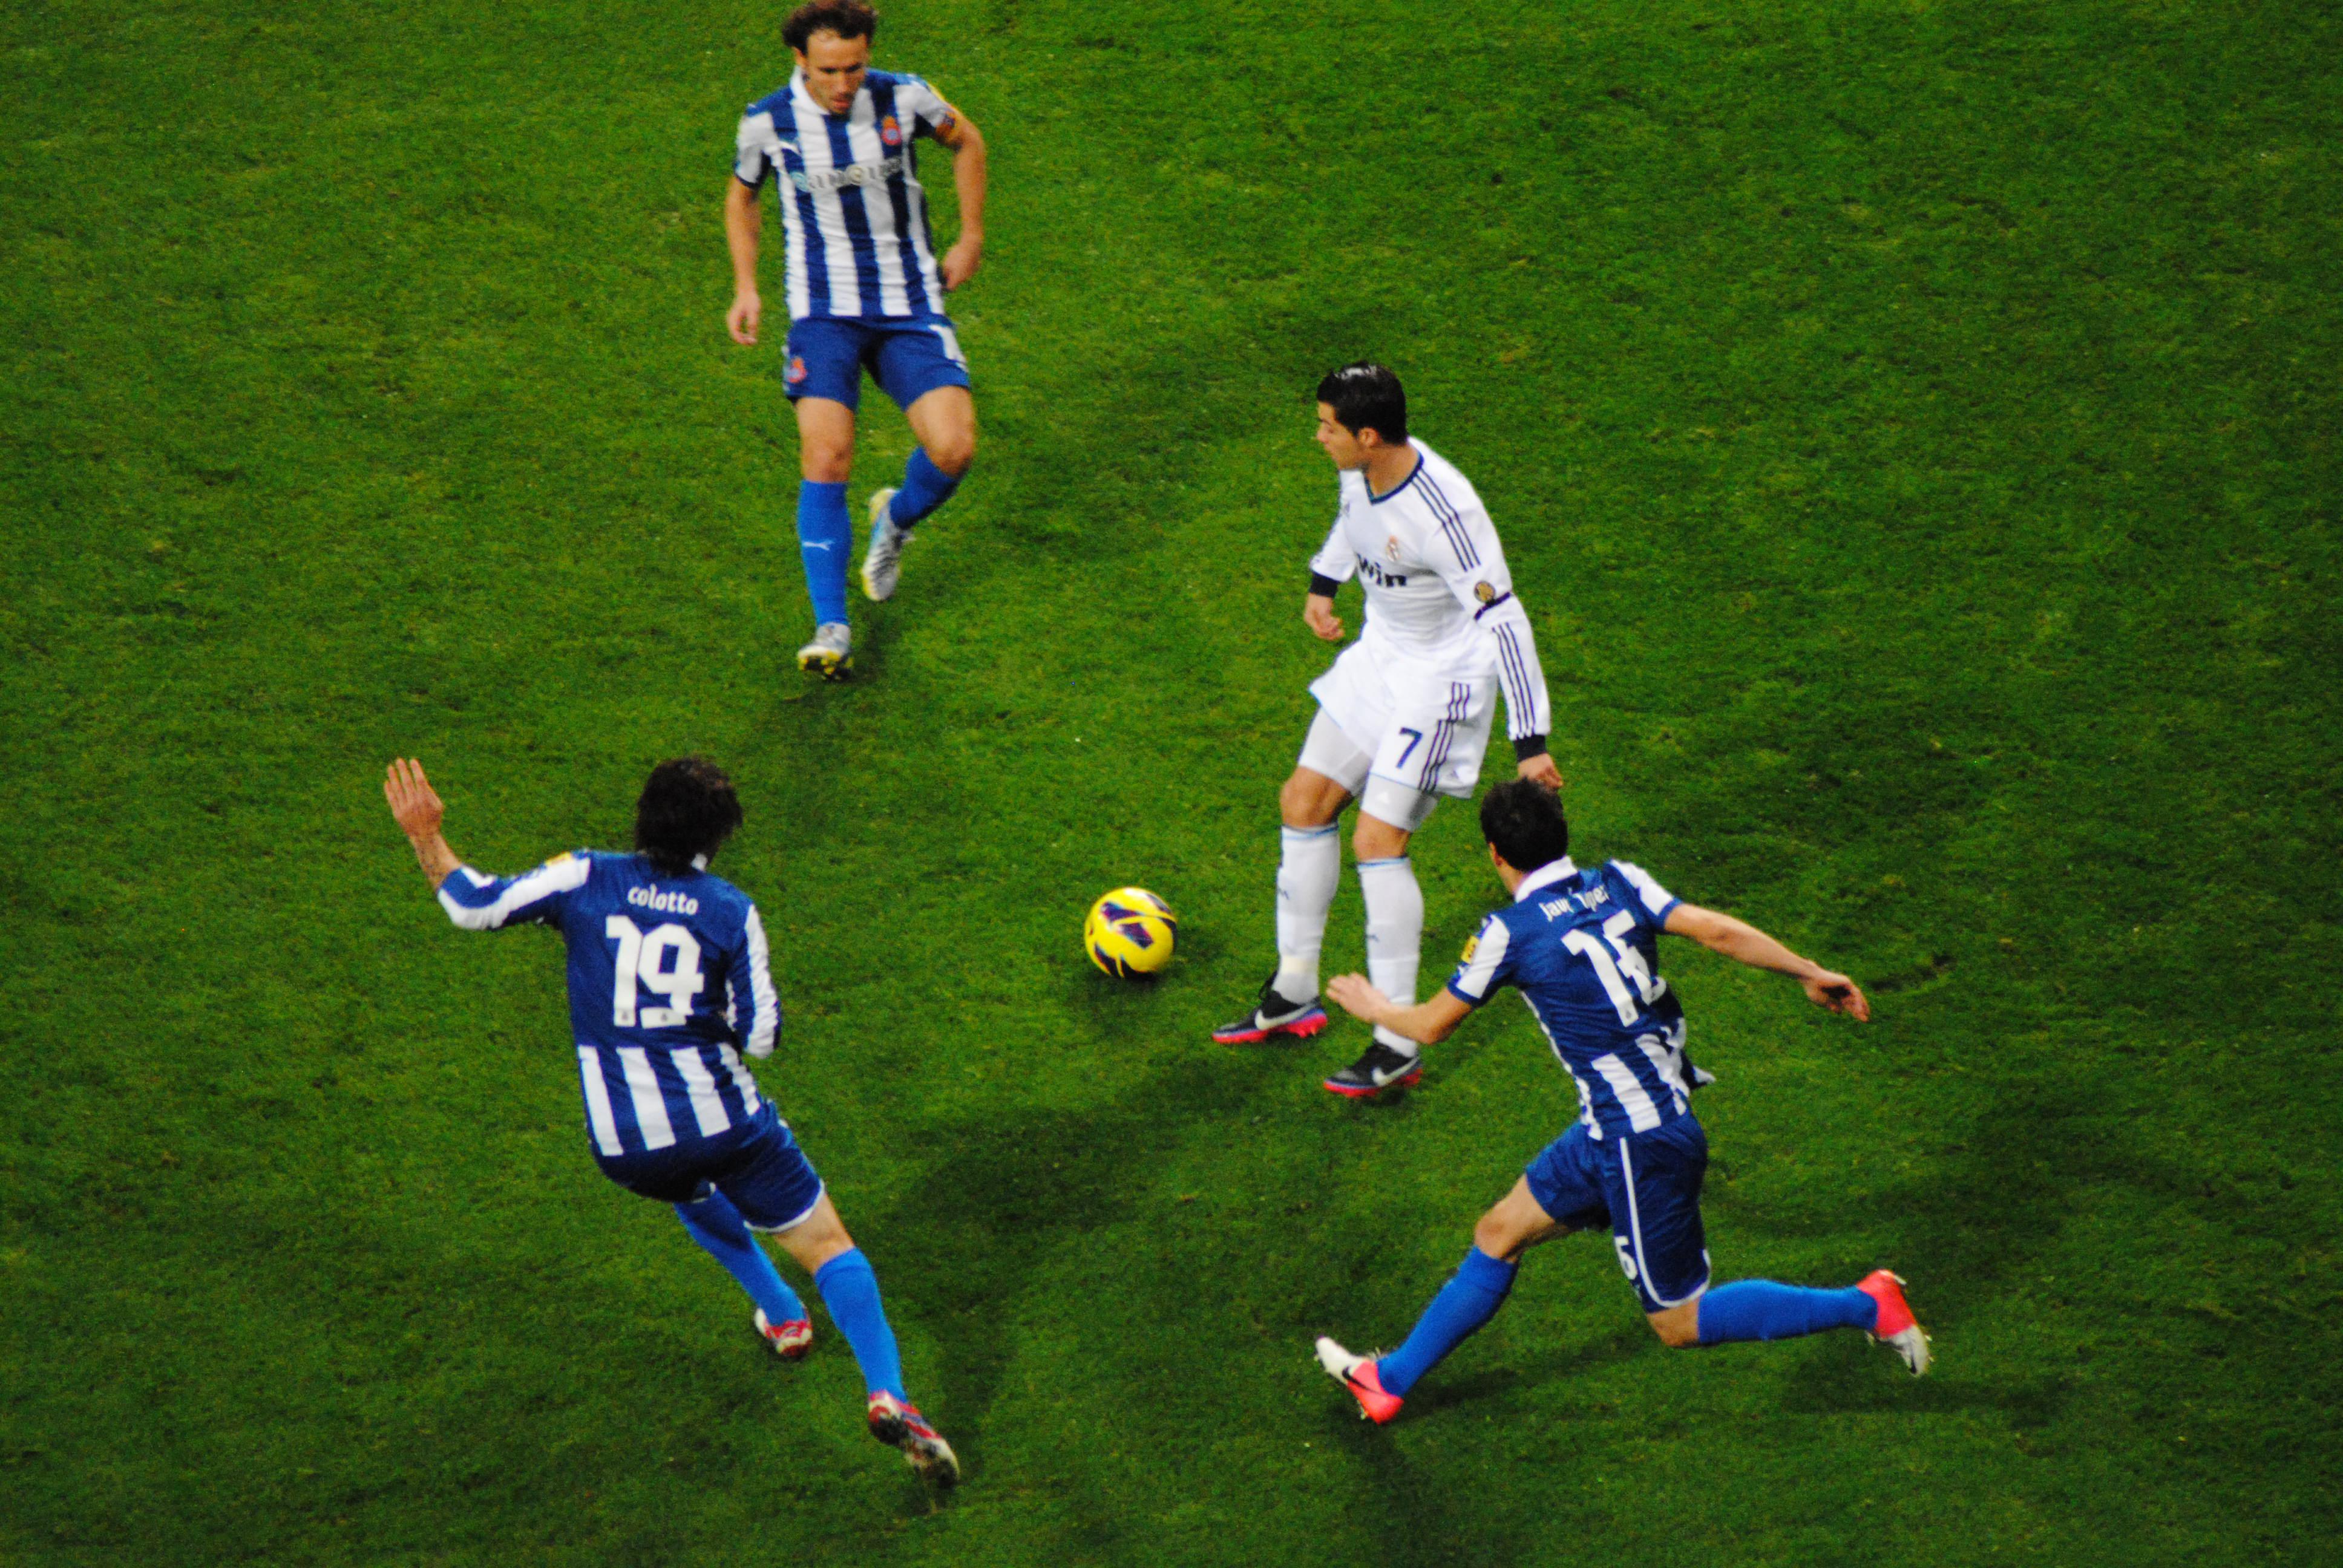 http://upload.wikimedia.org/wikipedia/commons/b/bf/Cristiano_Ronaldo_2012_Espanyol.jpg